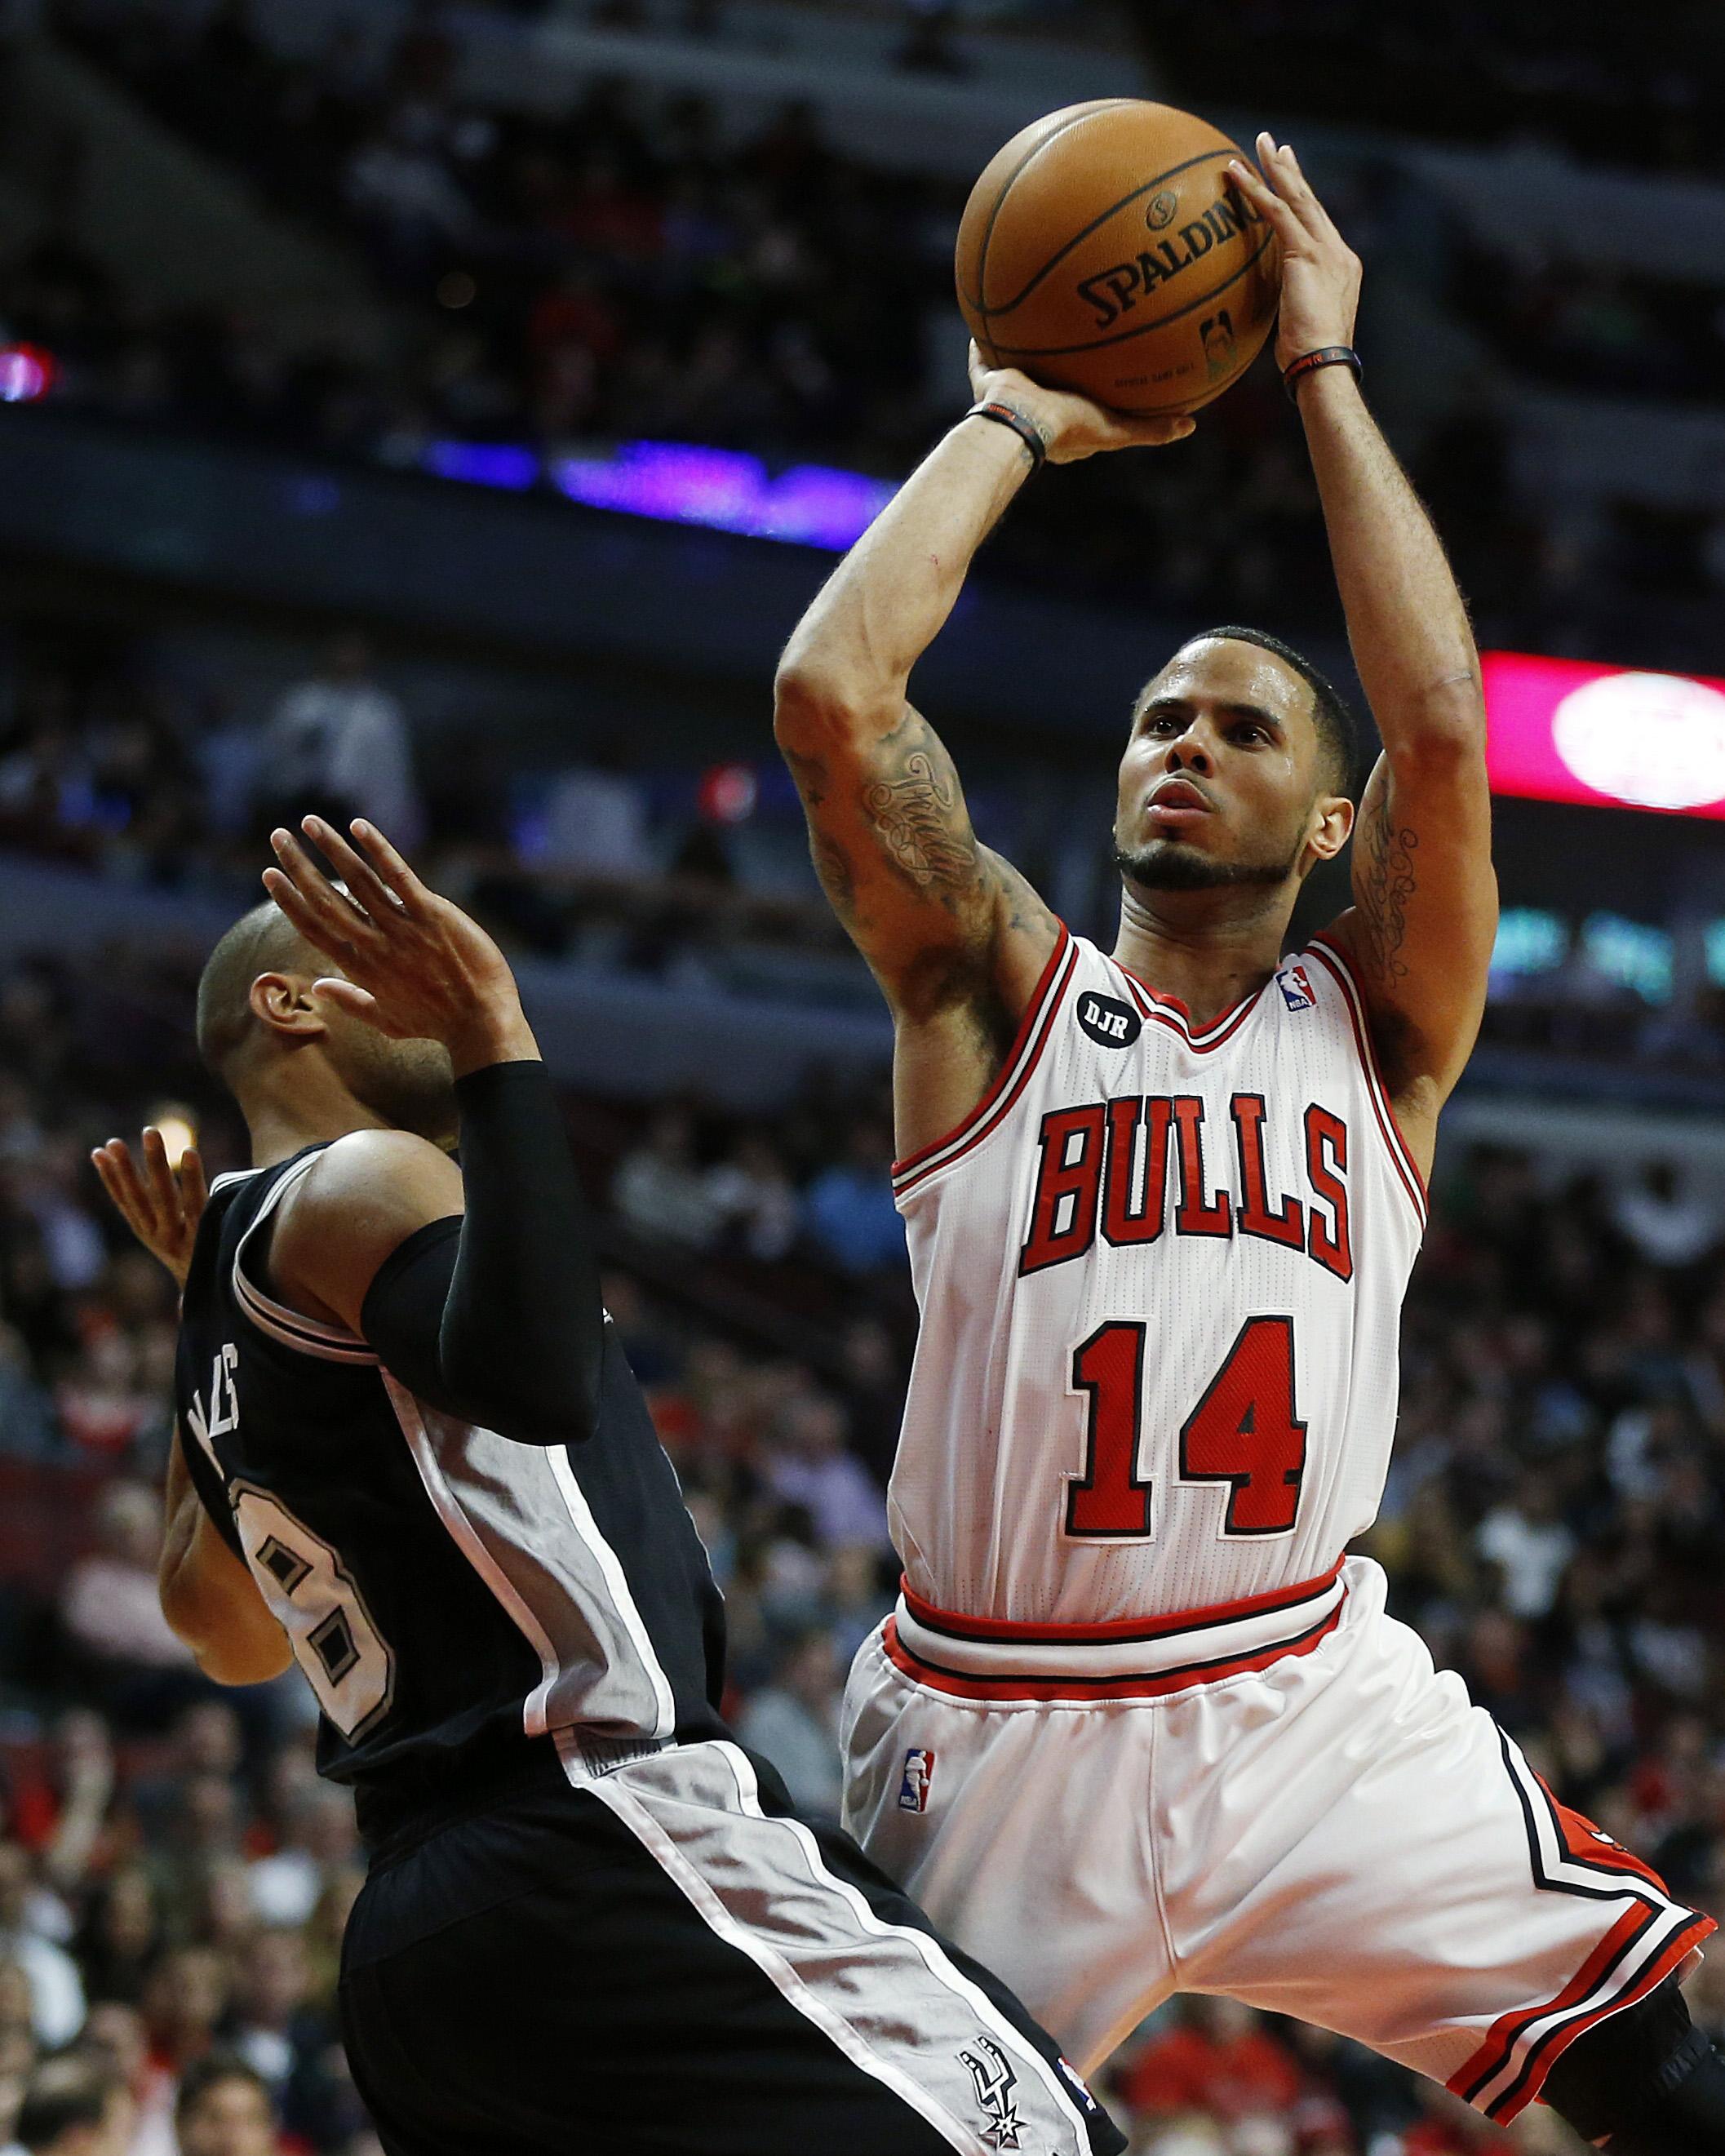 Ginobili leads Spurs past Bulls 104-96